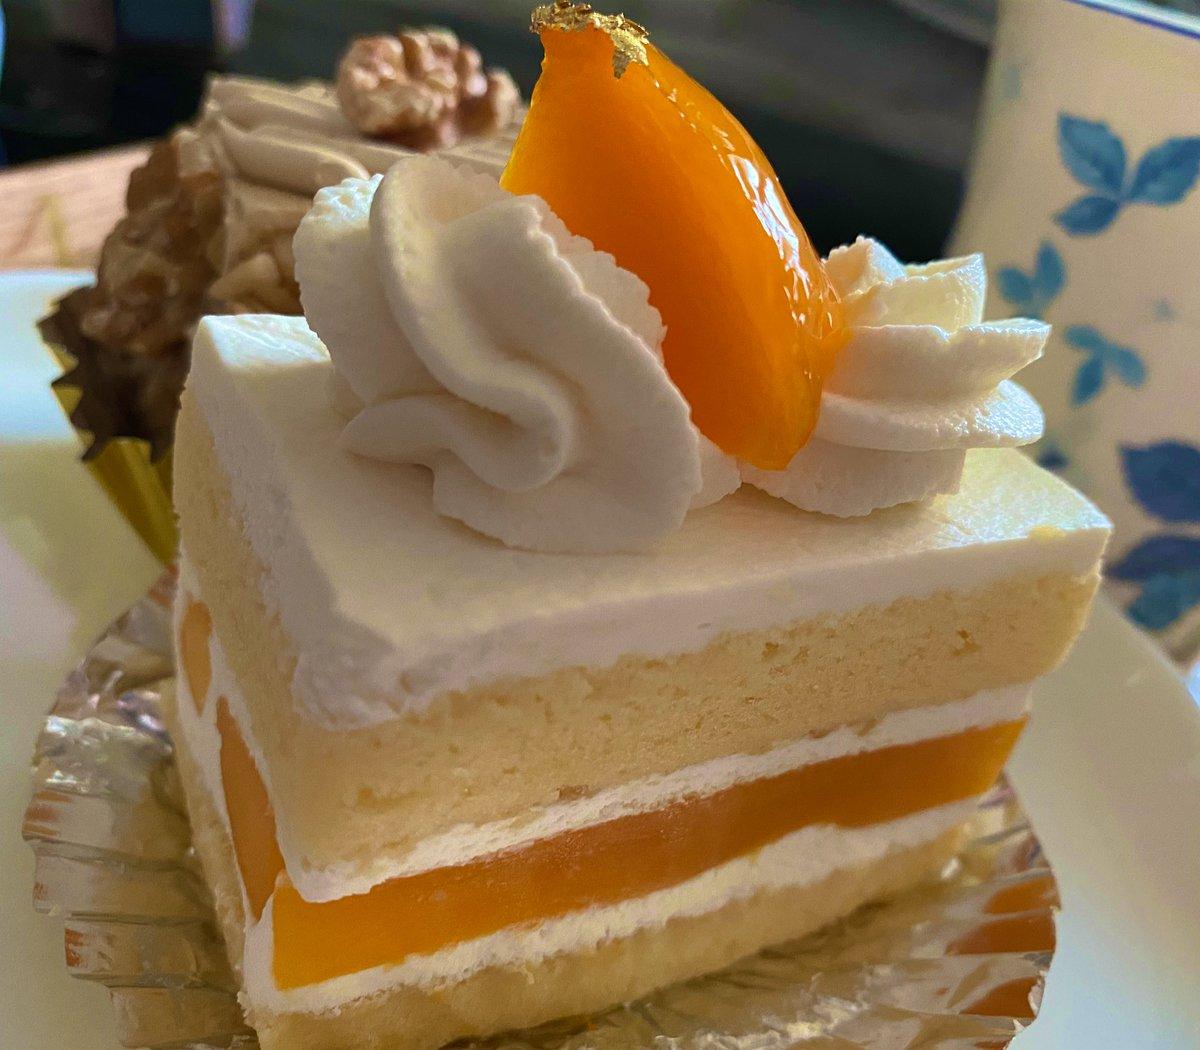 test ツイッターメディア - 銀座ウエストのマンゴーショートケーキagain 🥭🥭 さらに本気出してきた感ある 見てこの断面‼️🥺✨ https://t.co/y1BwyHwg0j